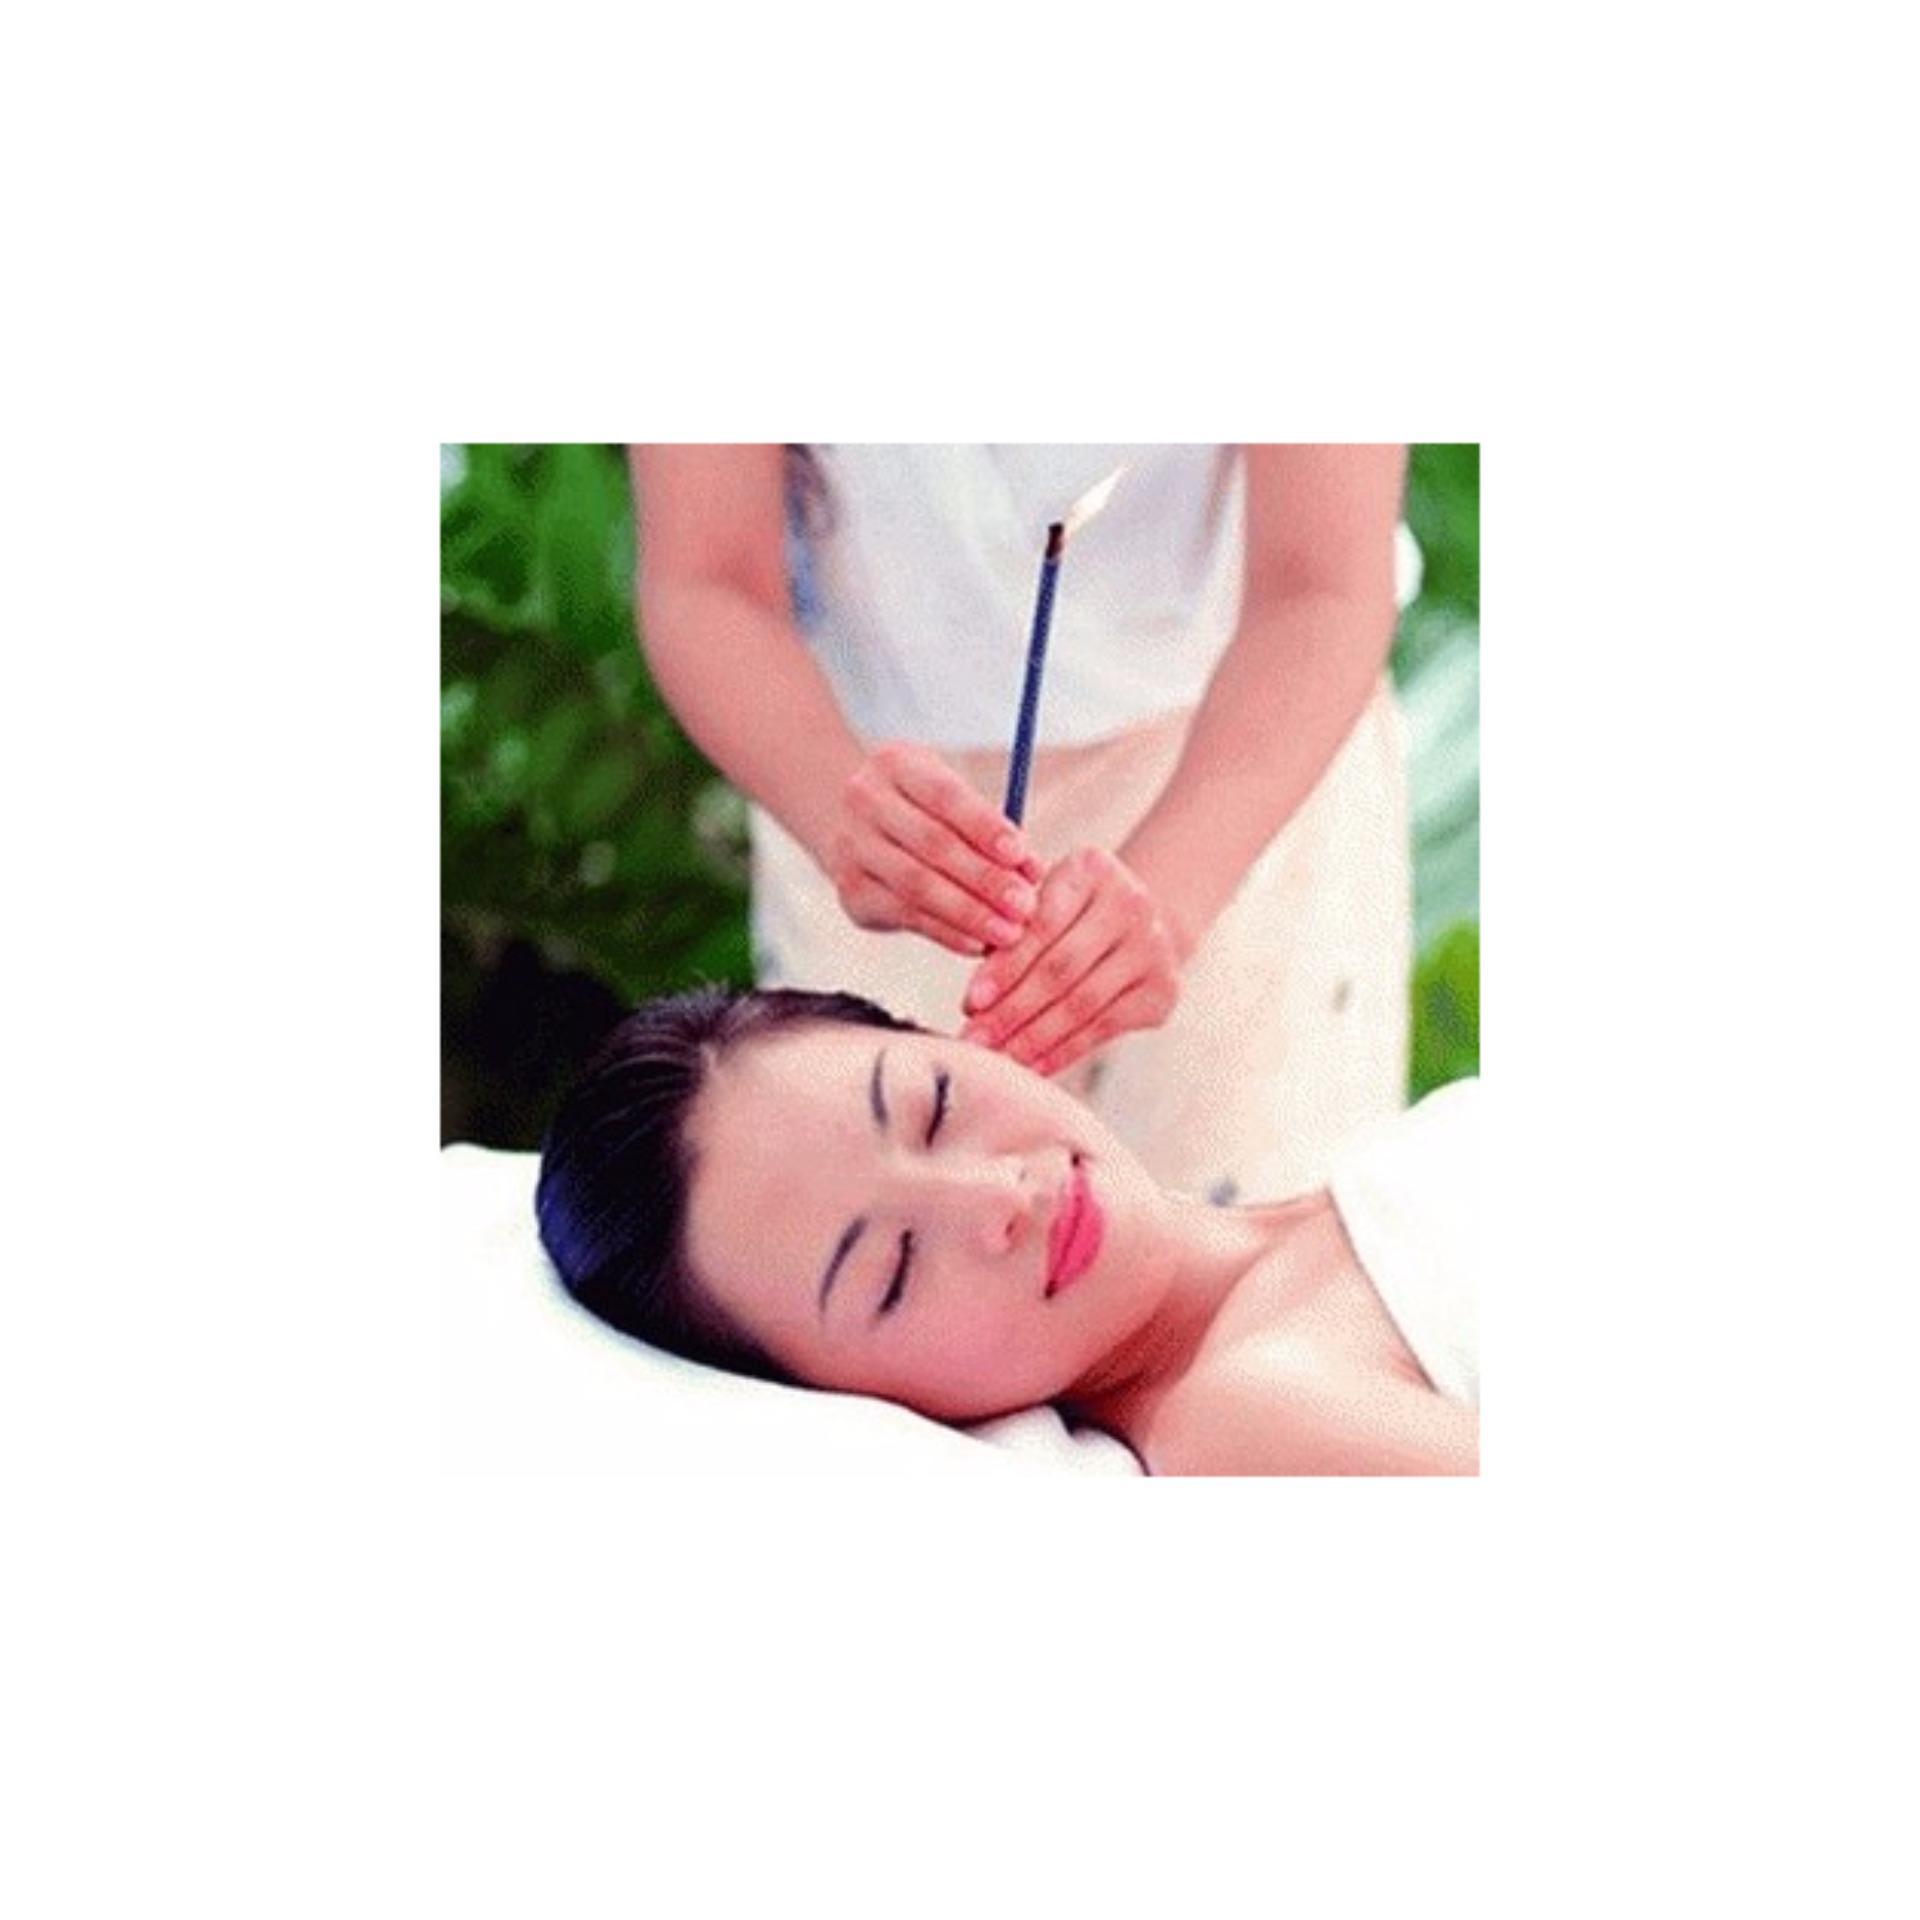 Alatkecantikan Lilin Aromaterapi Daftar Harga Terkini Termurah Ear Candle Pembersih Telinga Tipe Terompet Isi 2pcs No Plug Murah